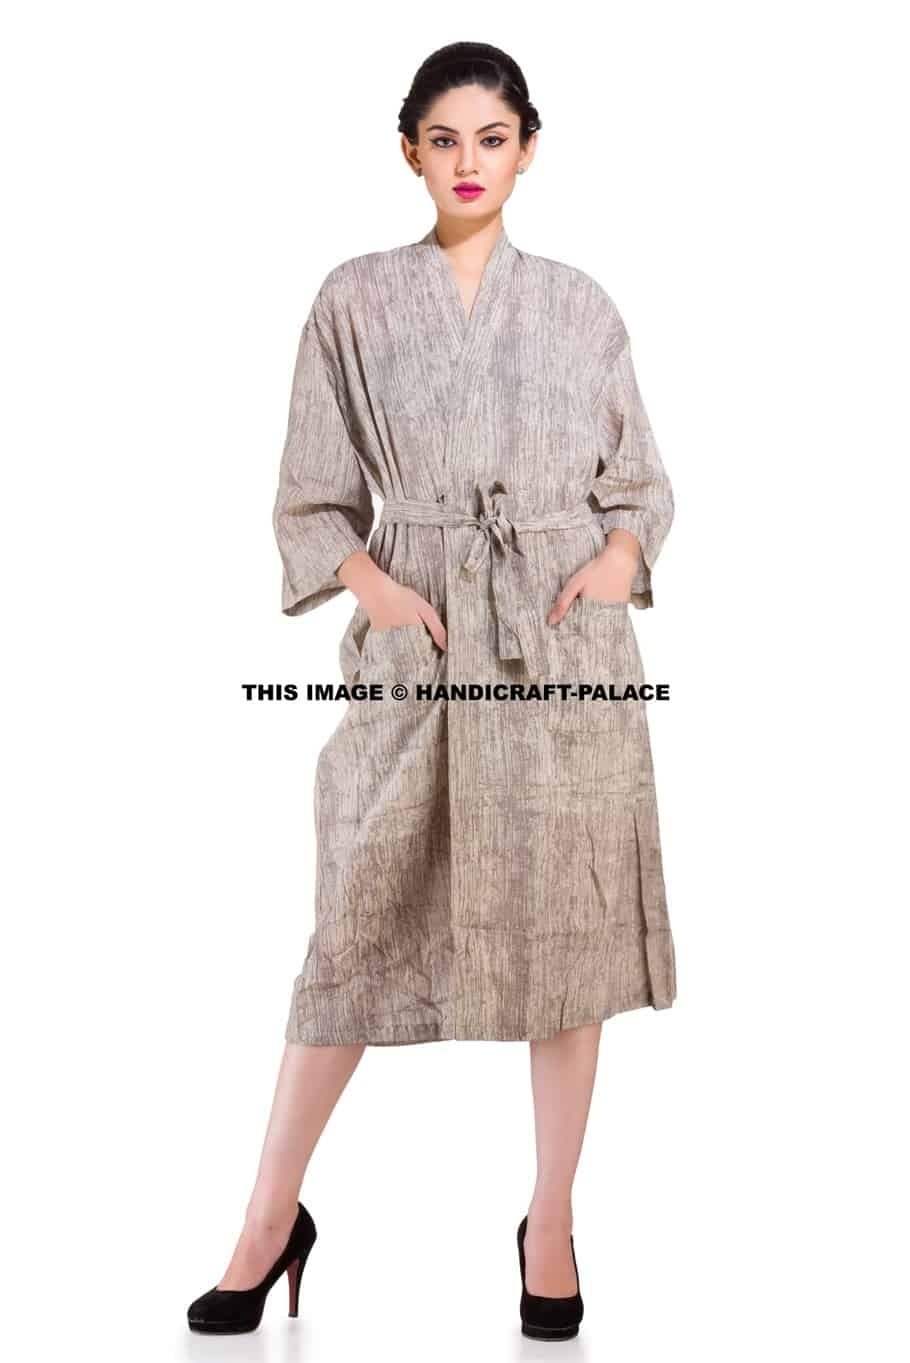 Indian Bath Robes Dressing - Handicraft Palace 457edfeeb